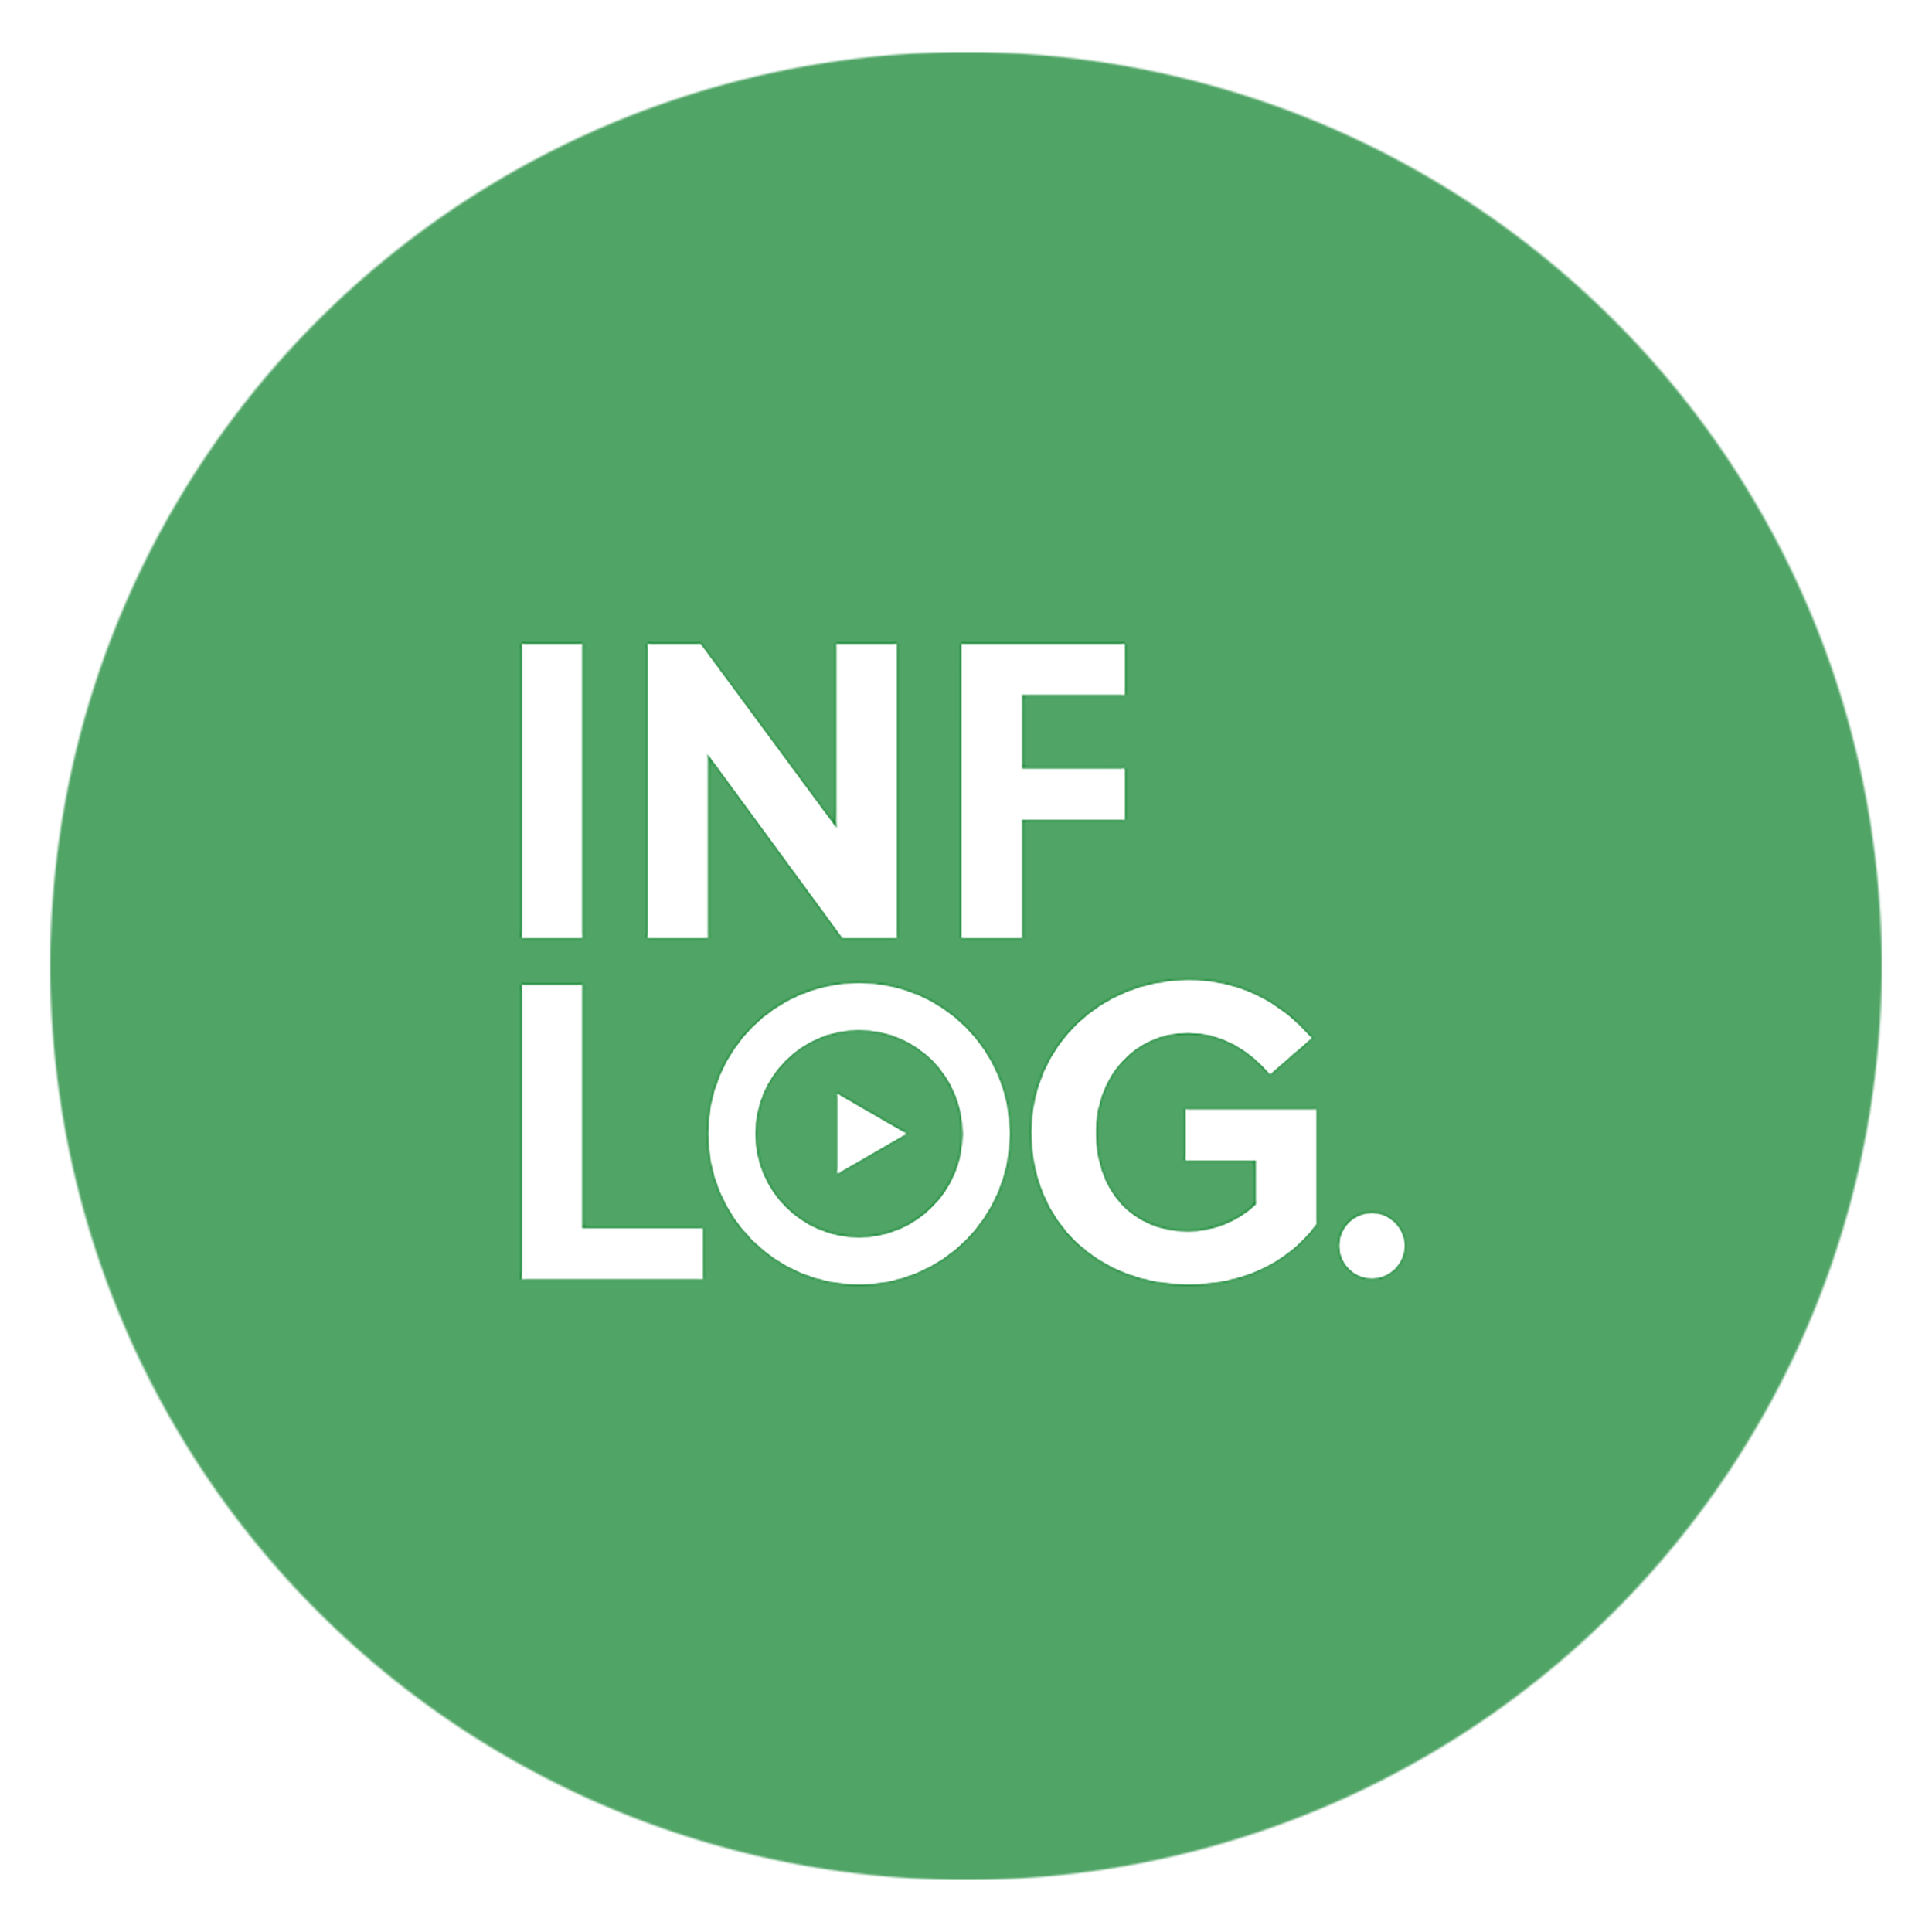 INFLOG_green circle.png